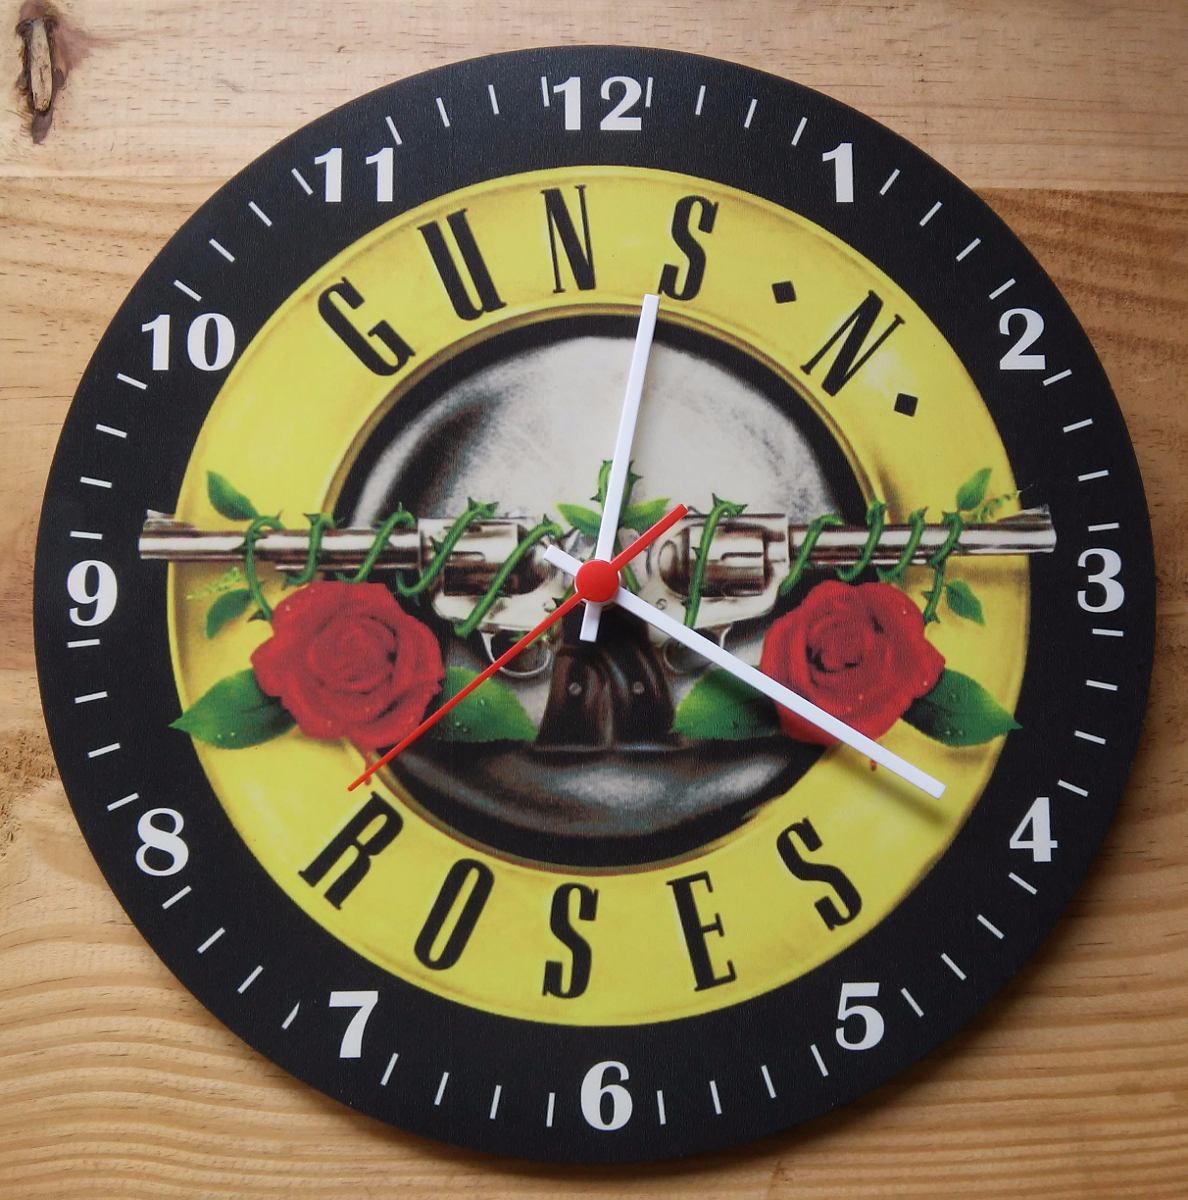 95fb4789c3e Relógio De Parede Guns N  Roses - Rock Disco Vinil Mod1 - R  45